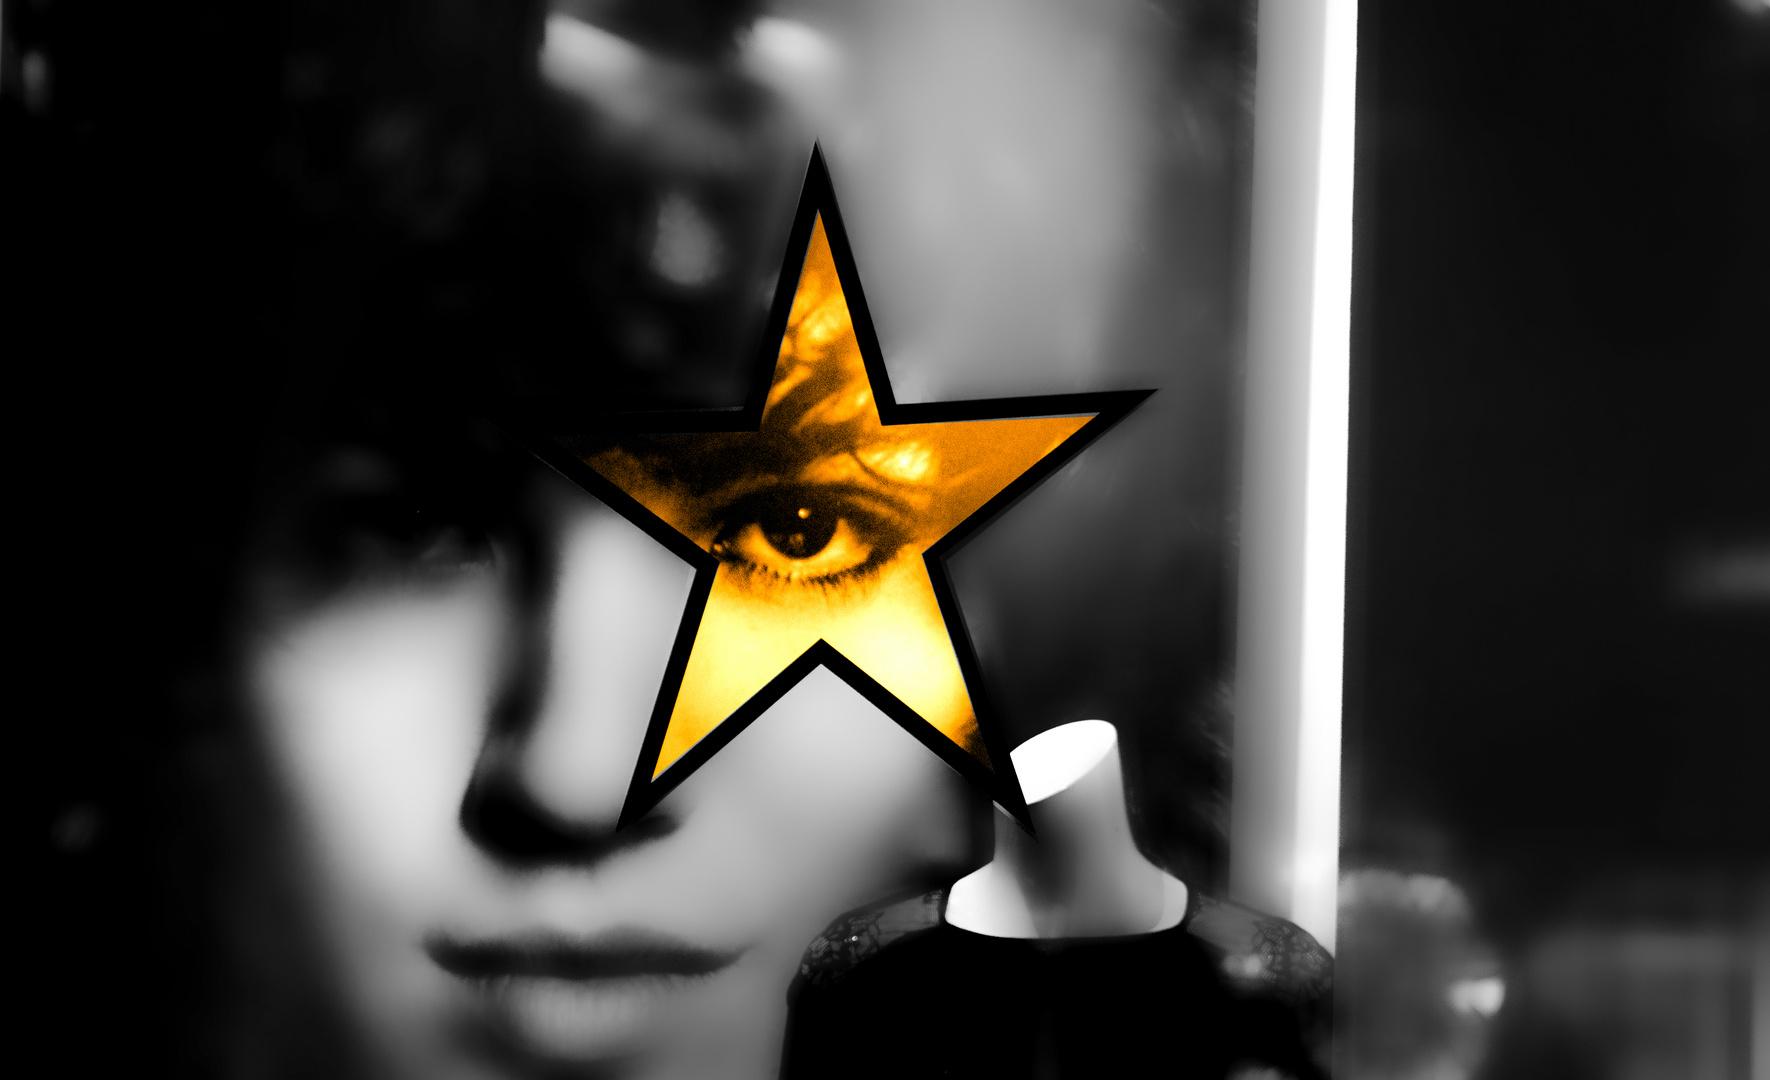 i saw the star